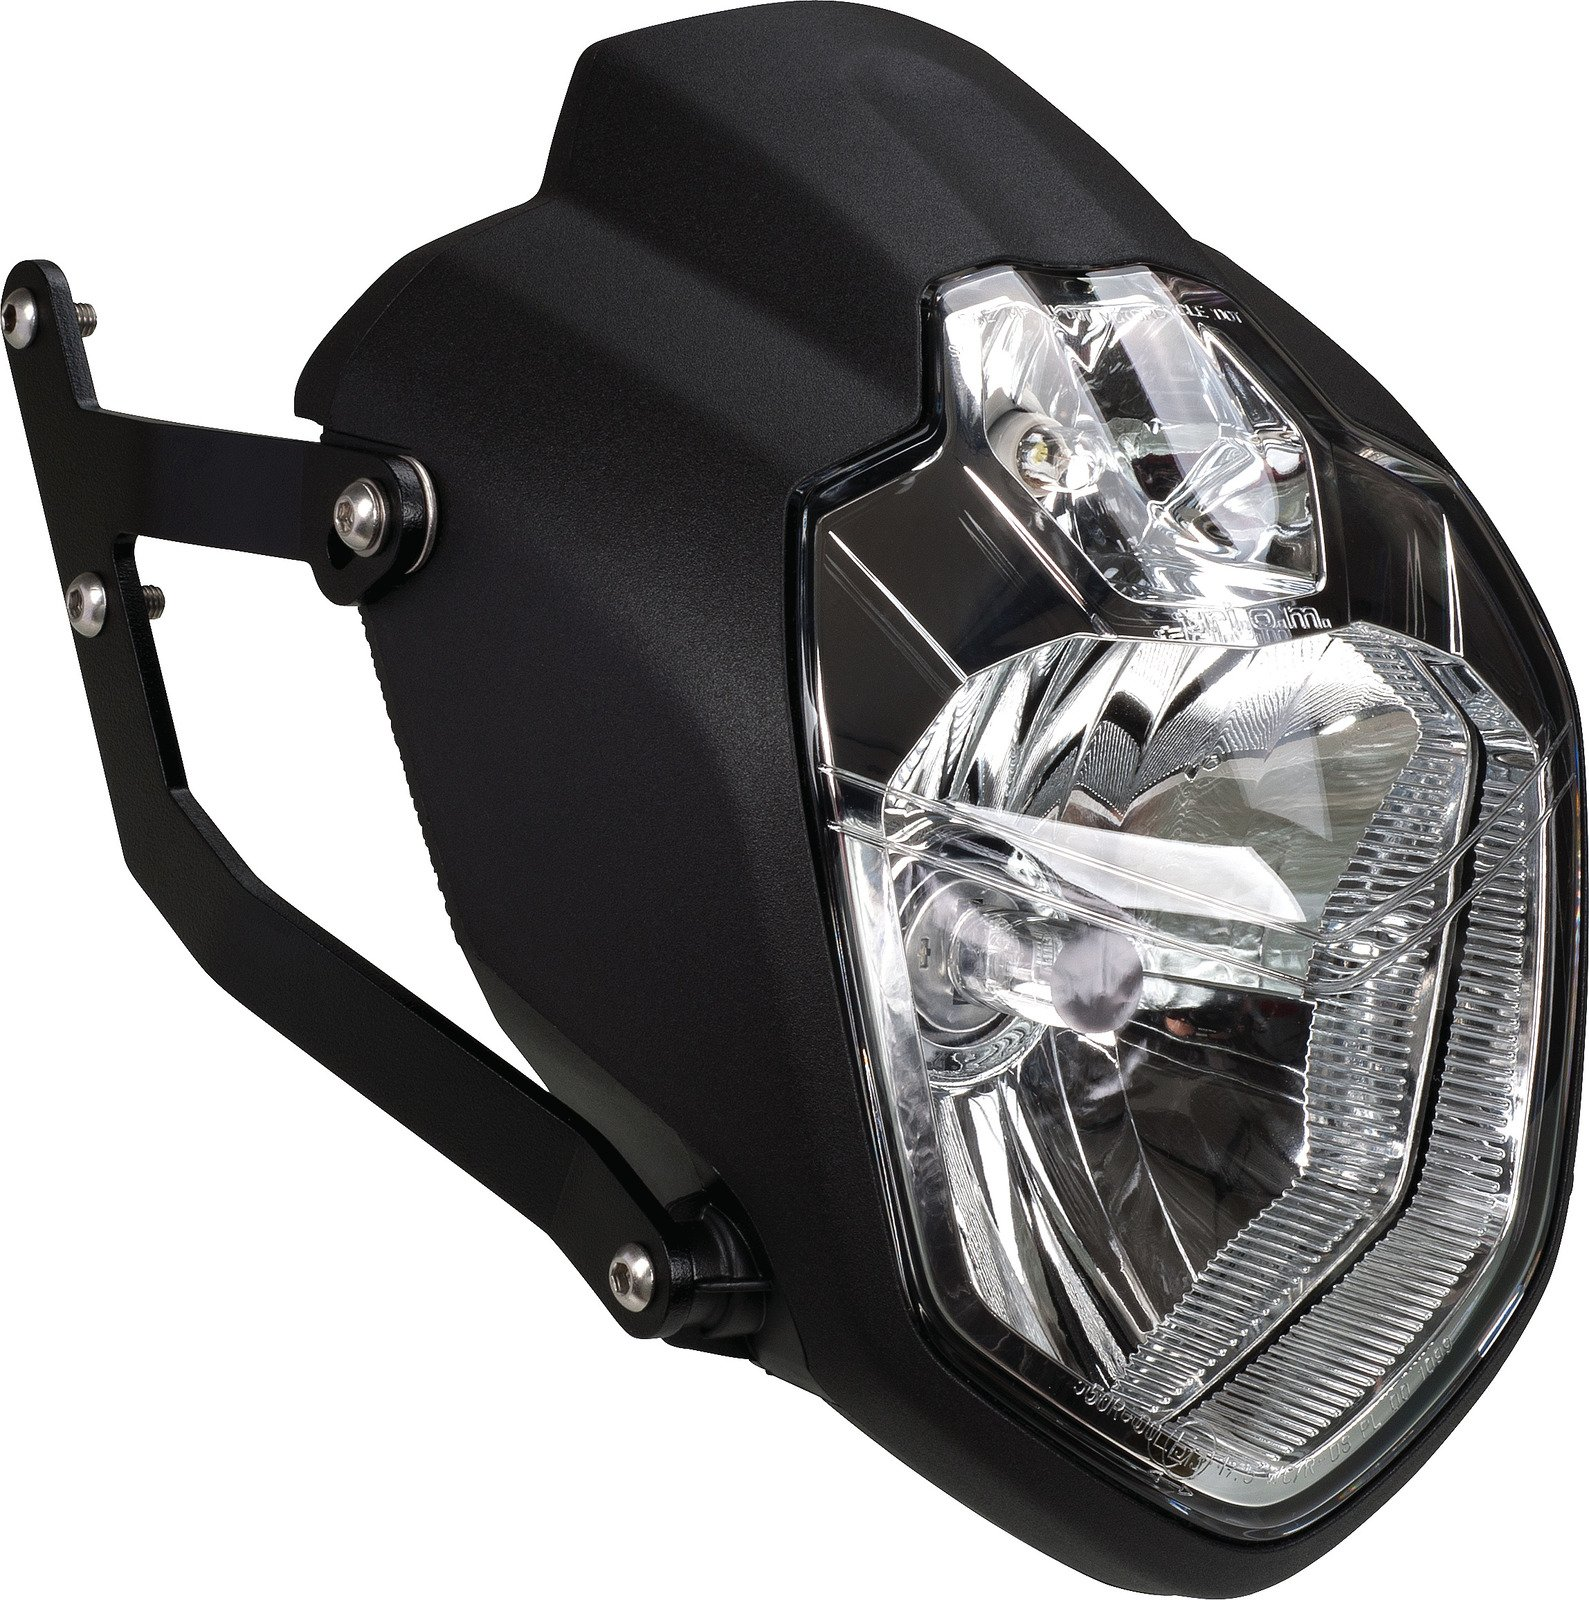 Yamaha XSR900 Wrenchmonkees Monkeebeast Headlight w/ Stainless Steel Brackets WM0030